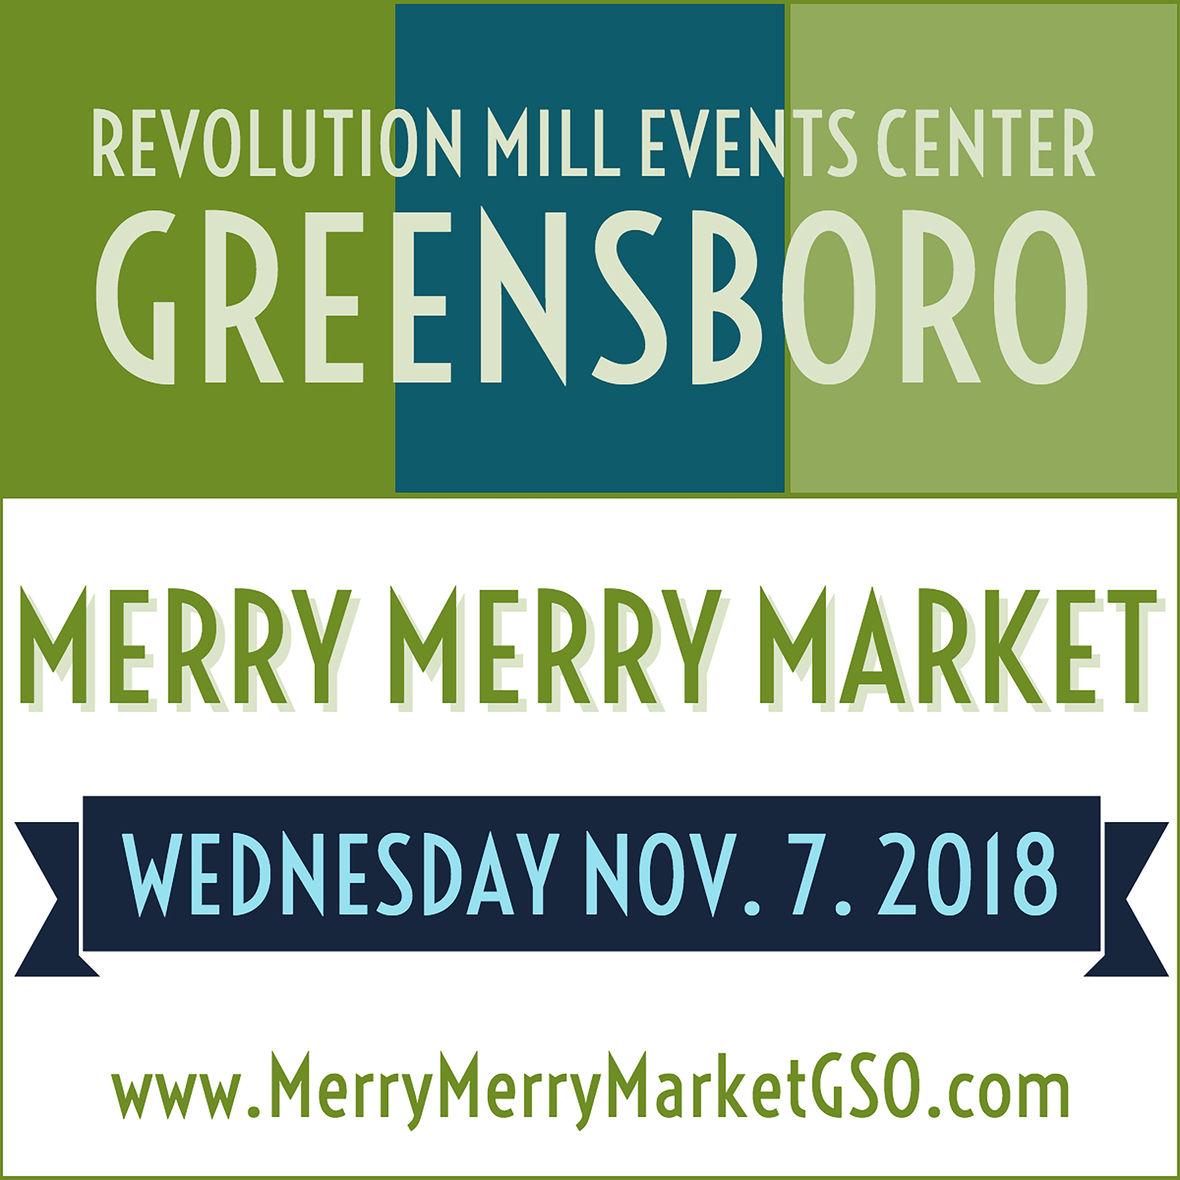 merry merry market